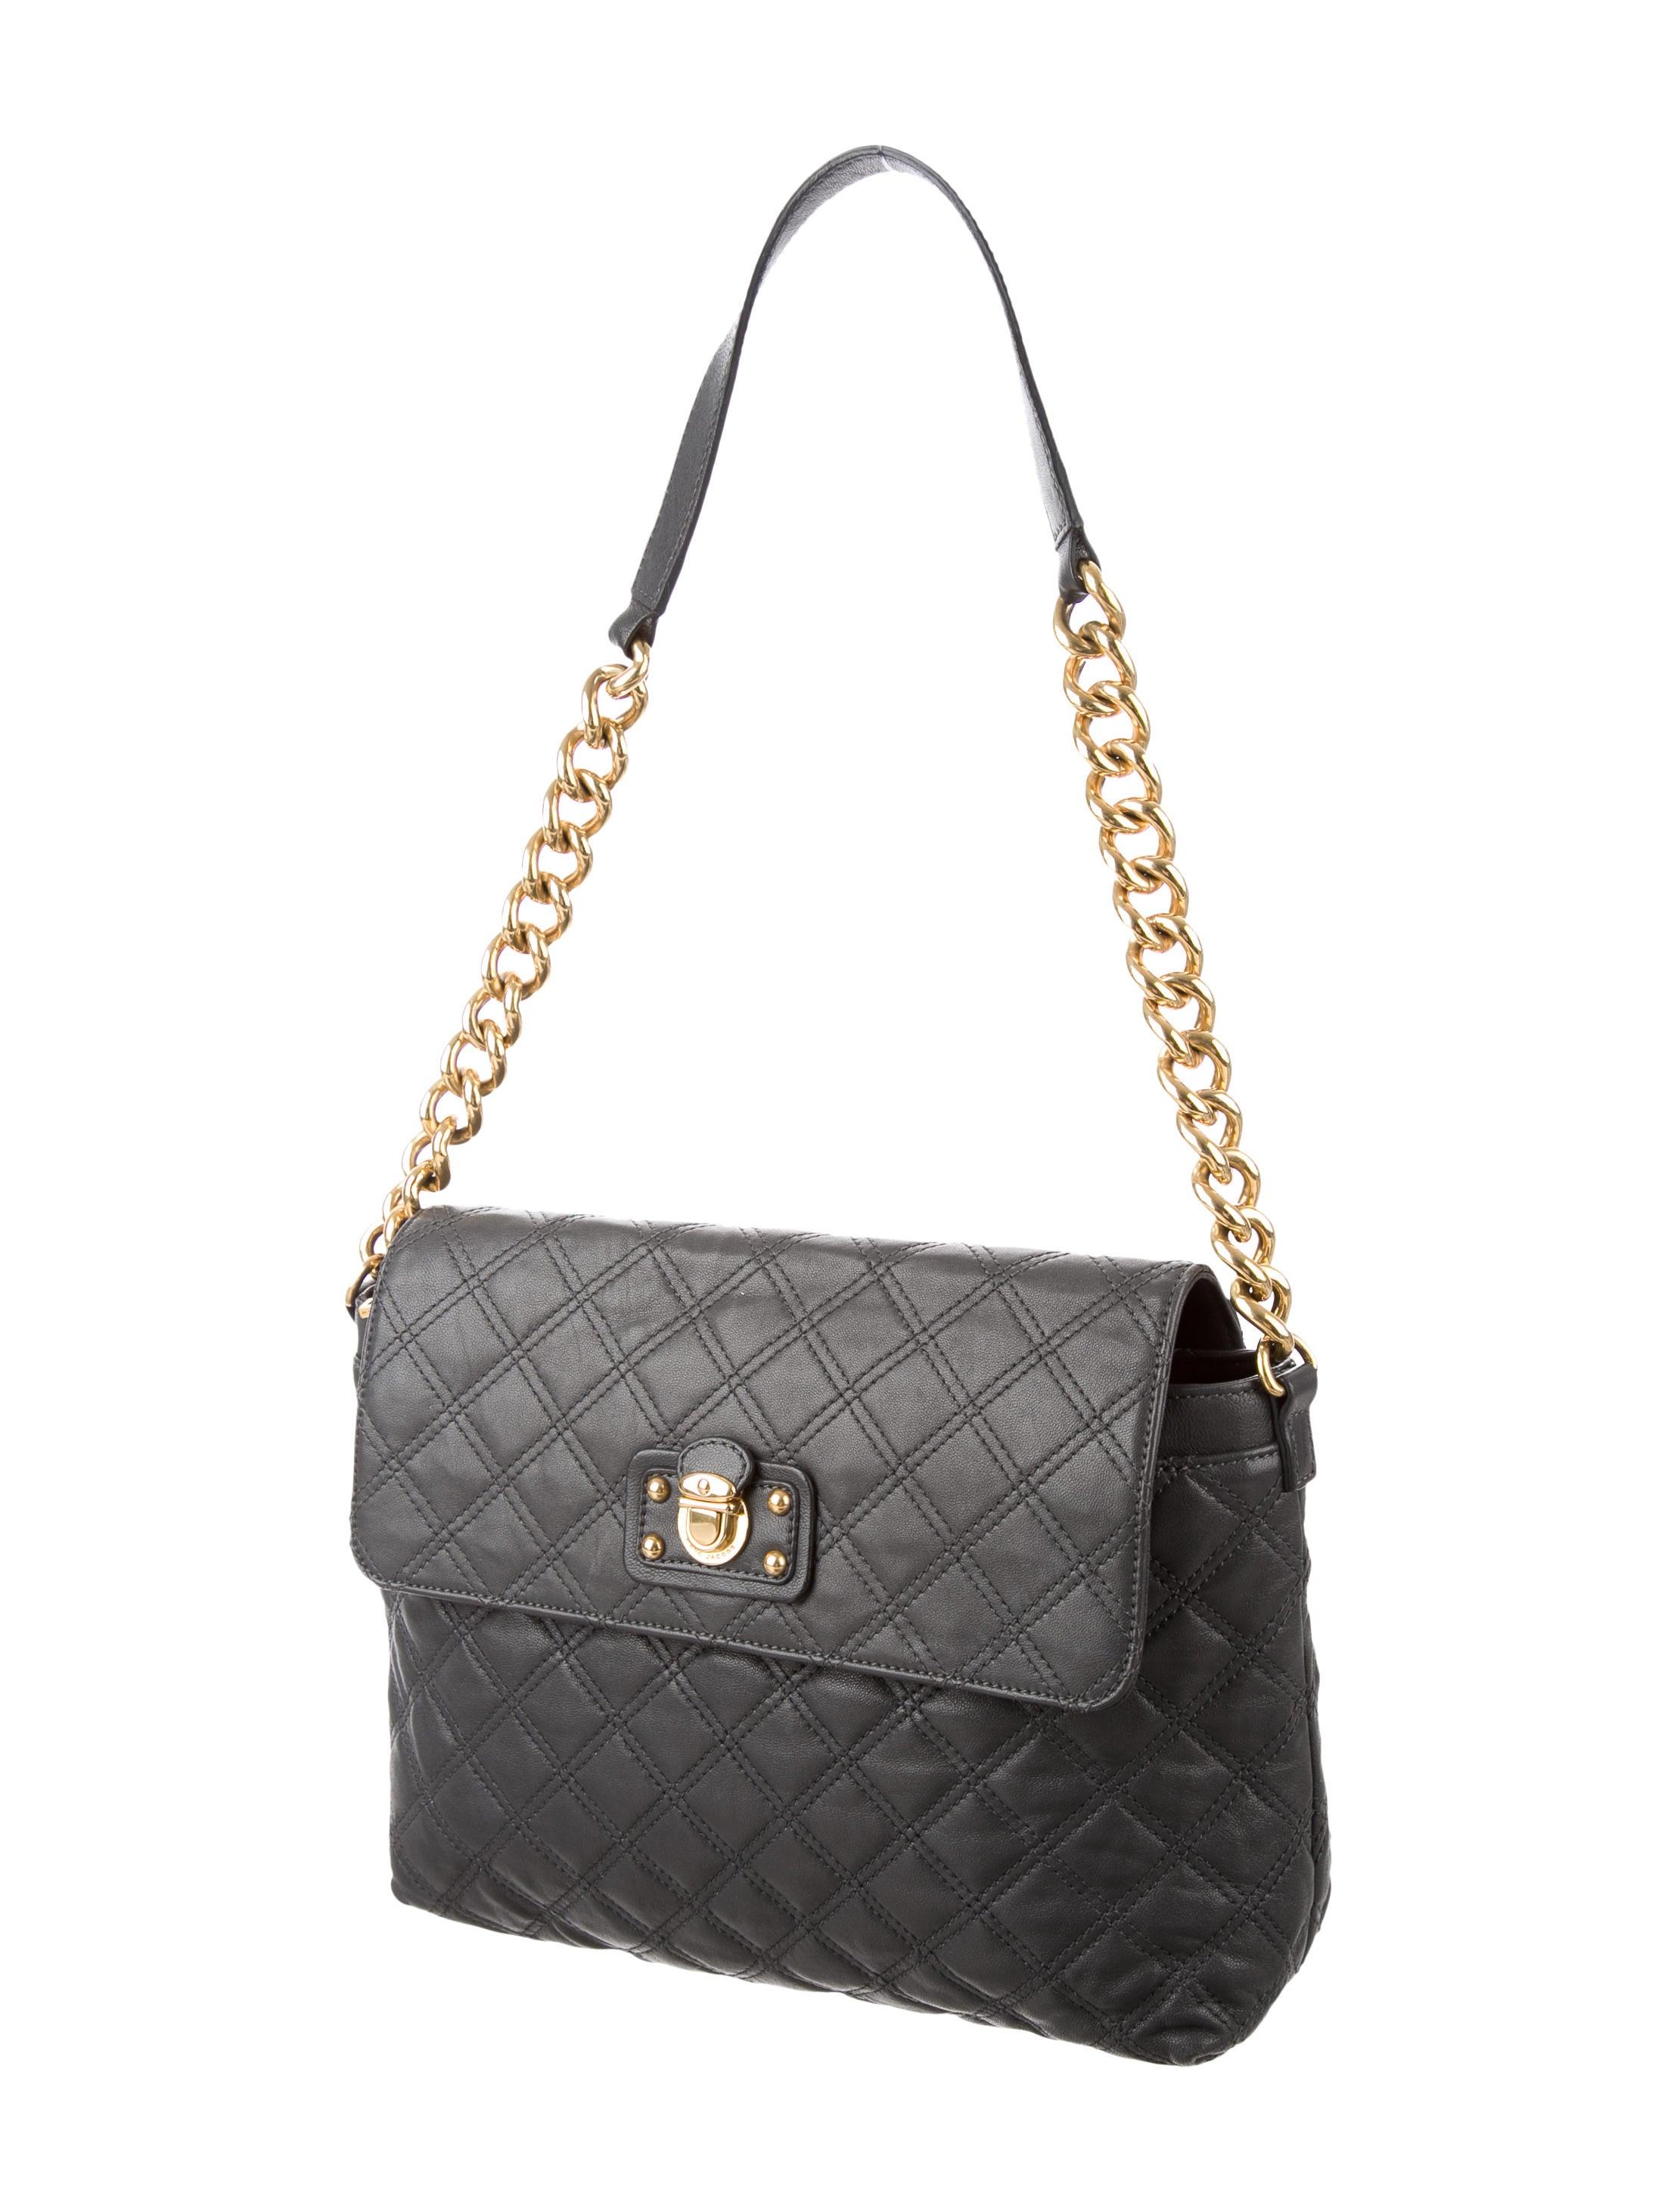 quilted: Handbags, Purses & Wallets | Dillard's